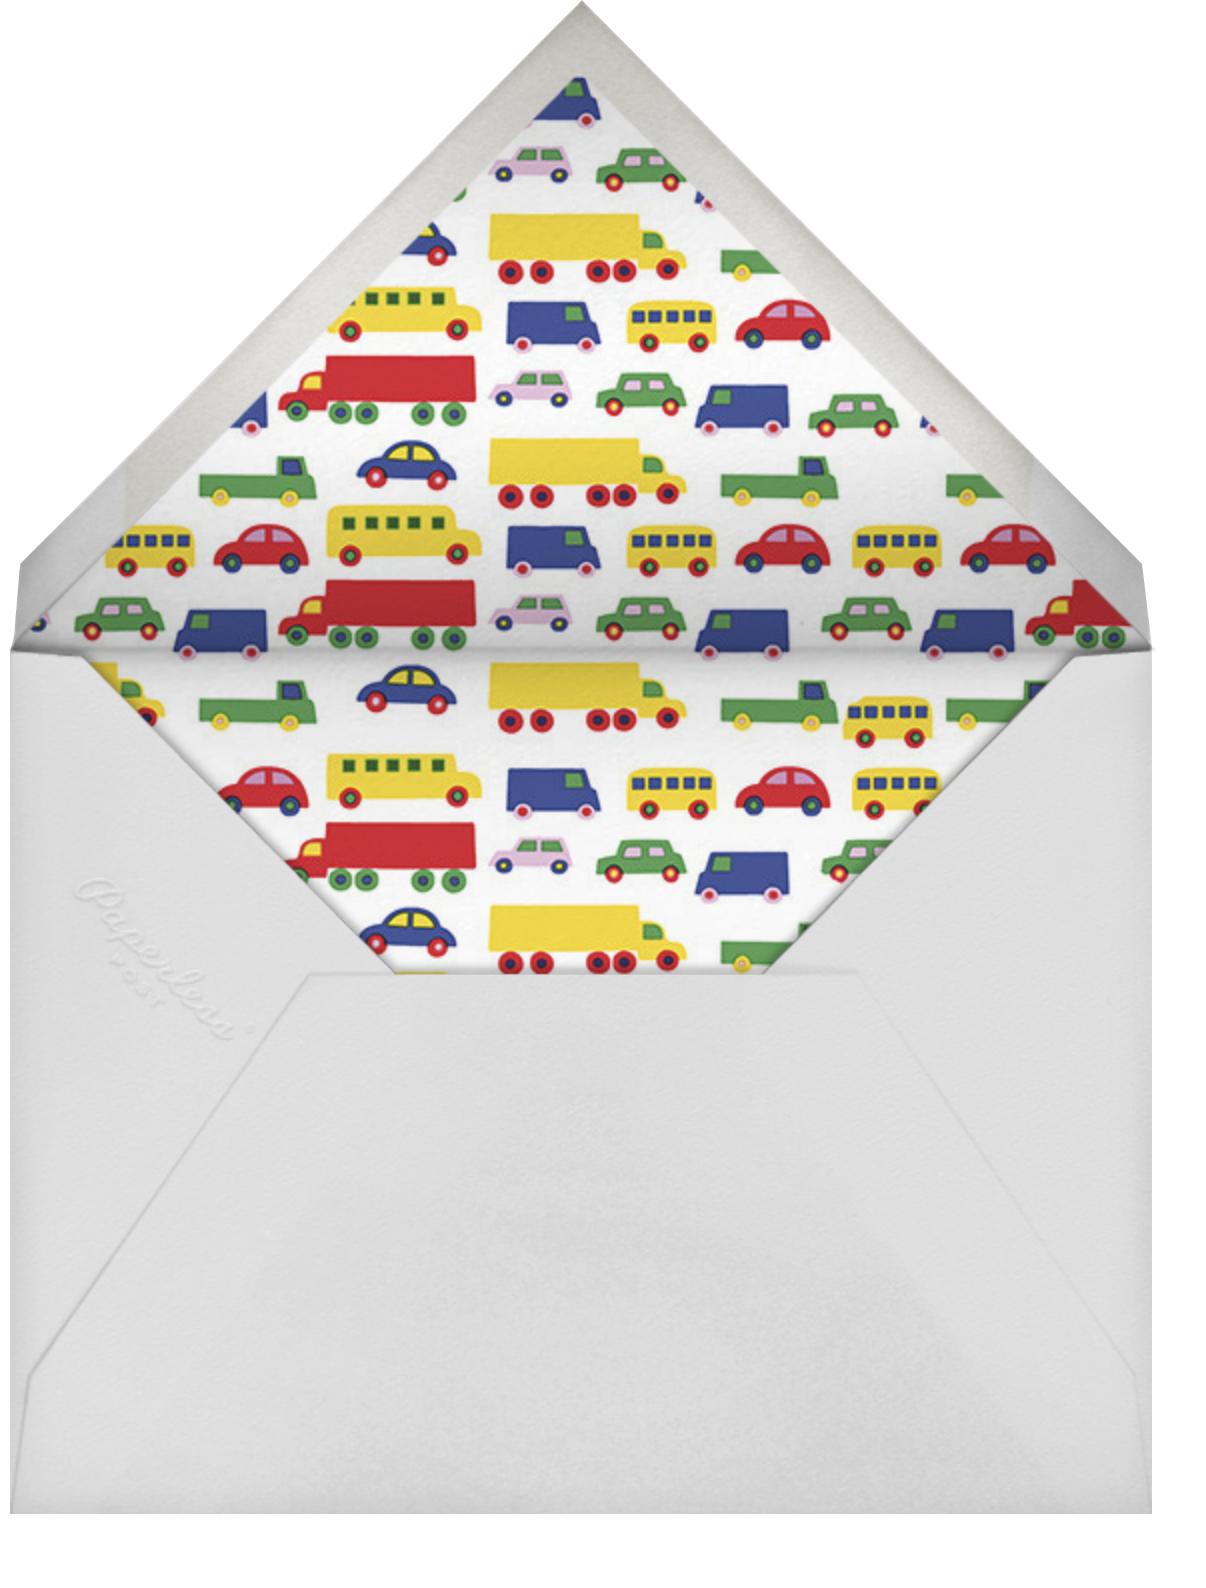 Bo Boo (Stationery) - Marimekko - Personal Stationery - envelope back